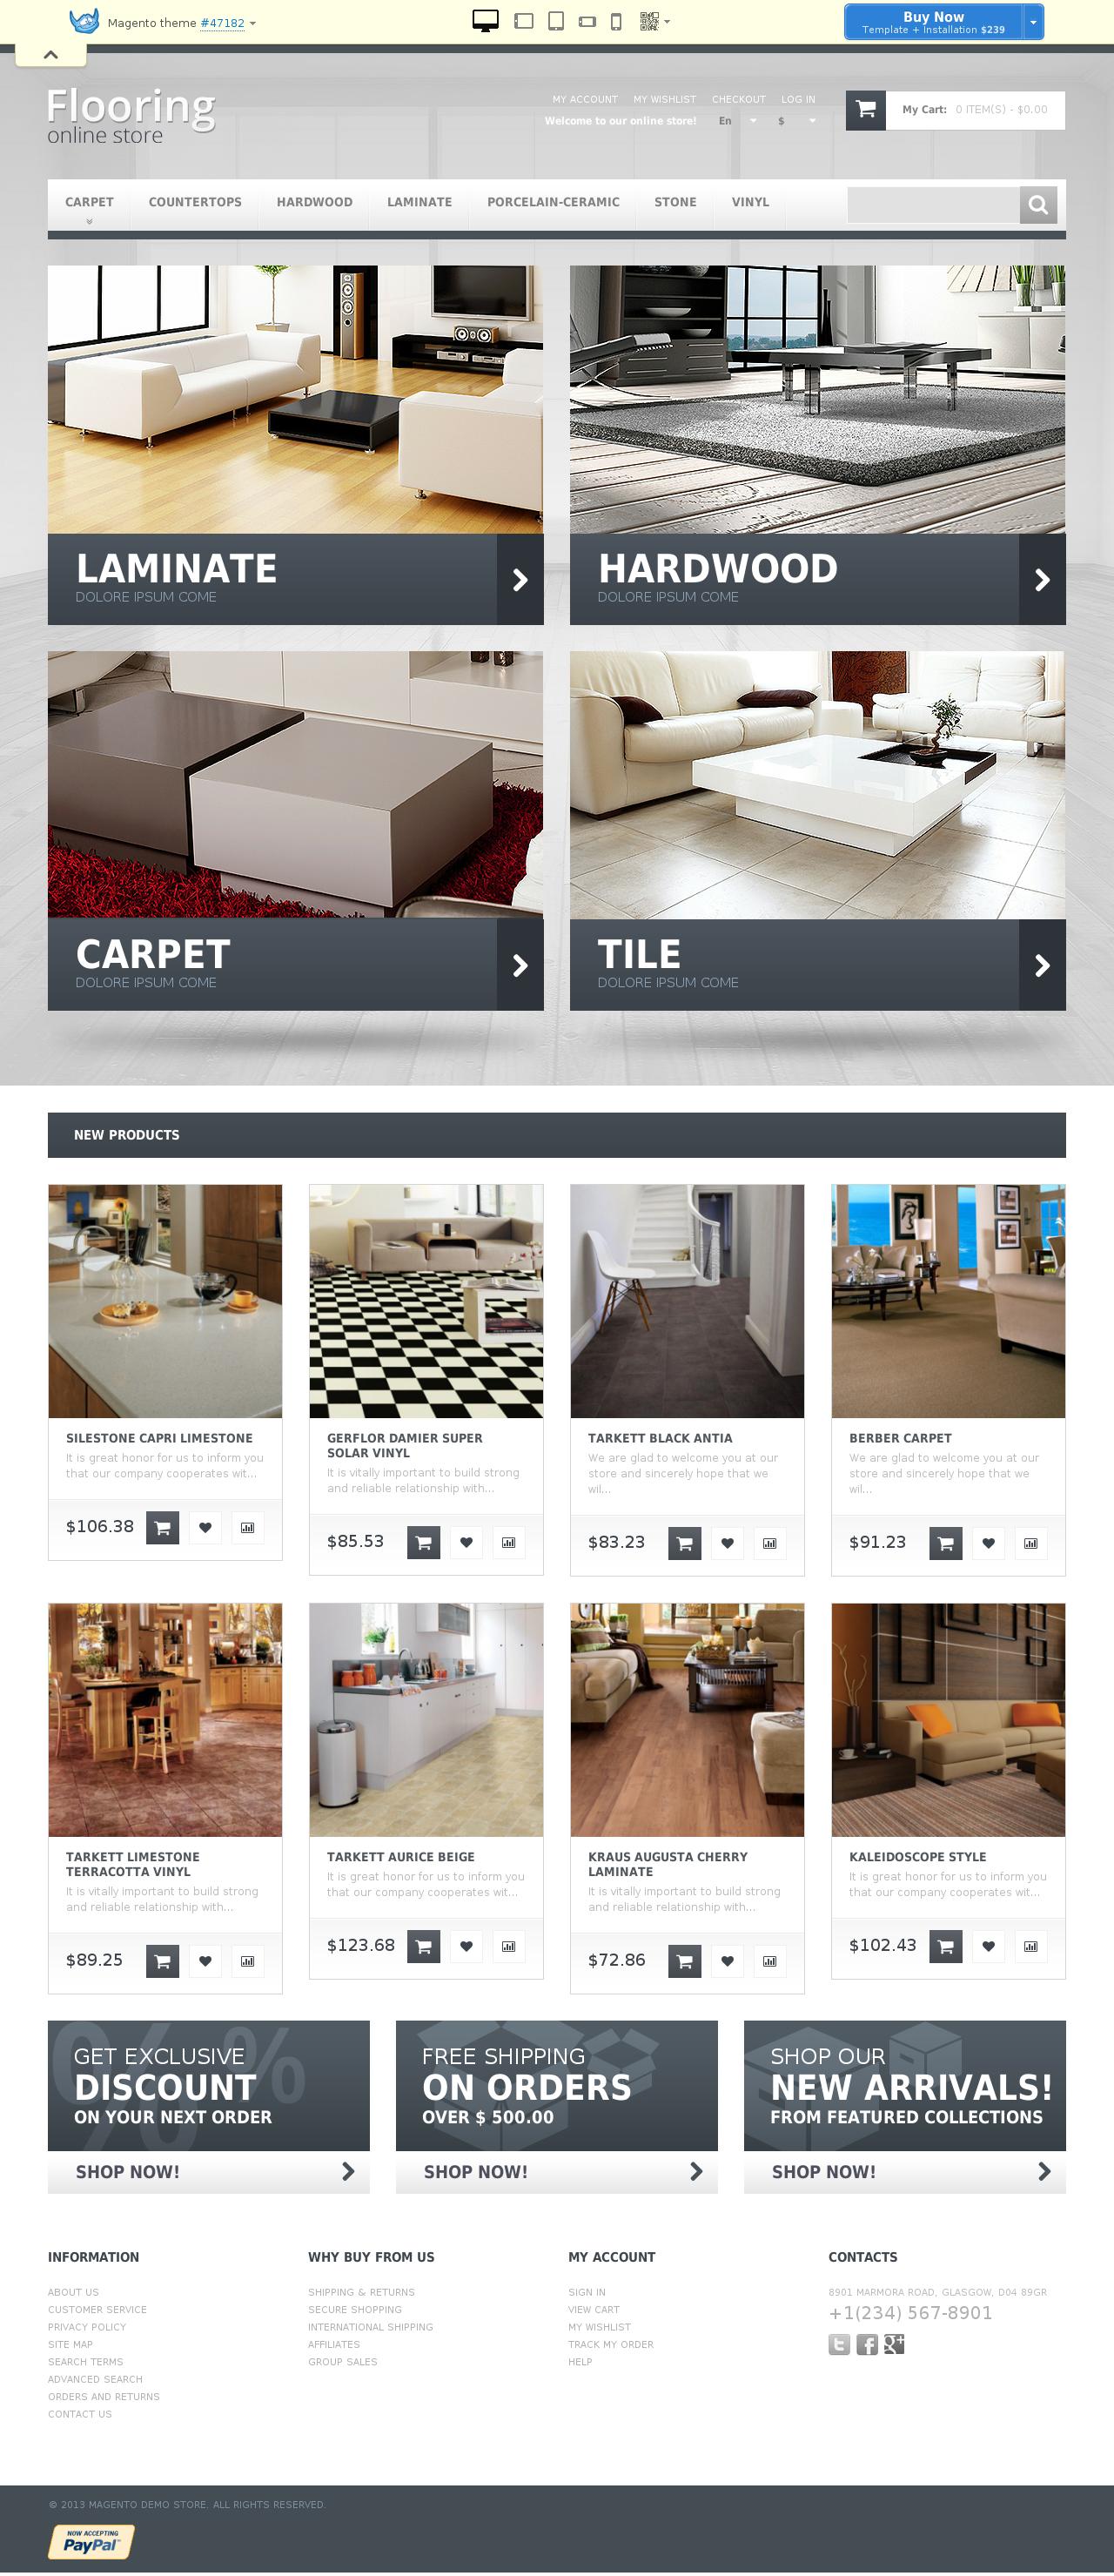 Durable Flooring Magento Theme #47182